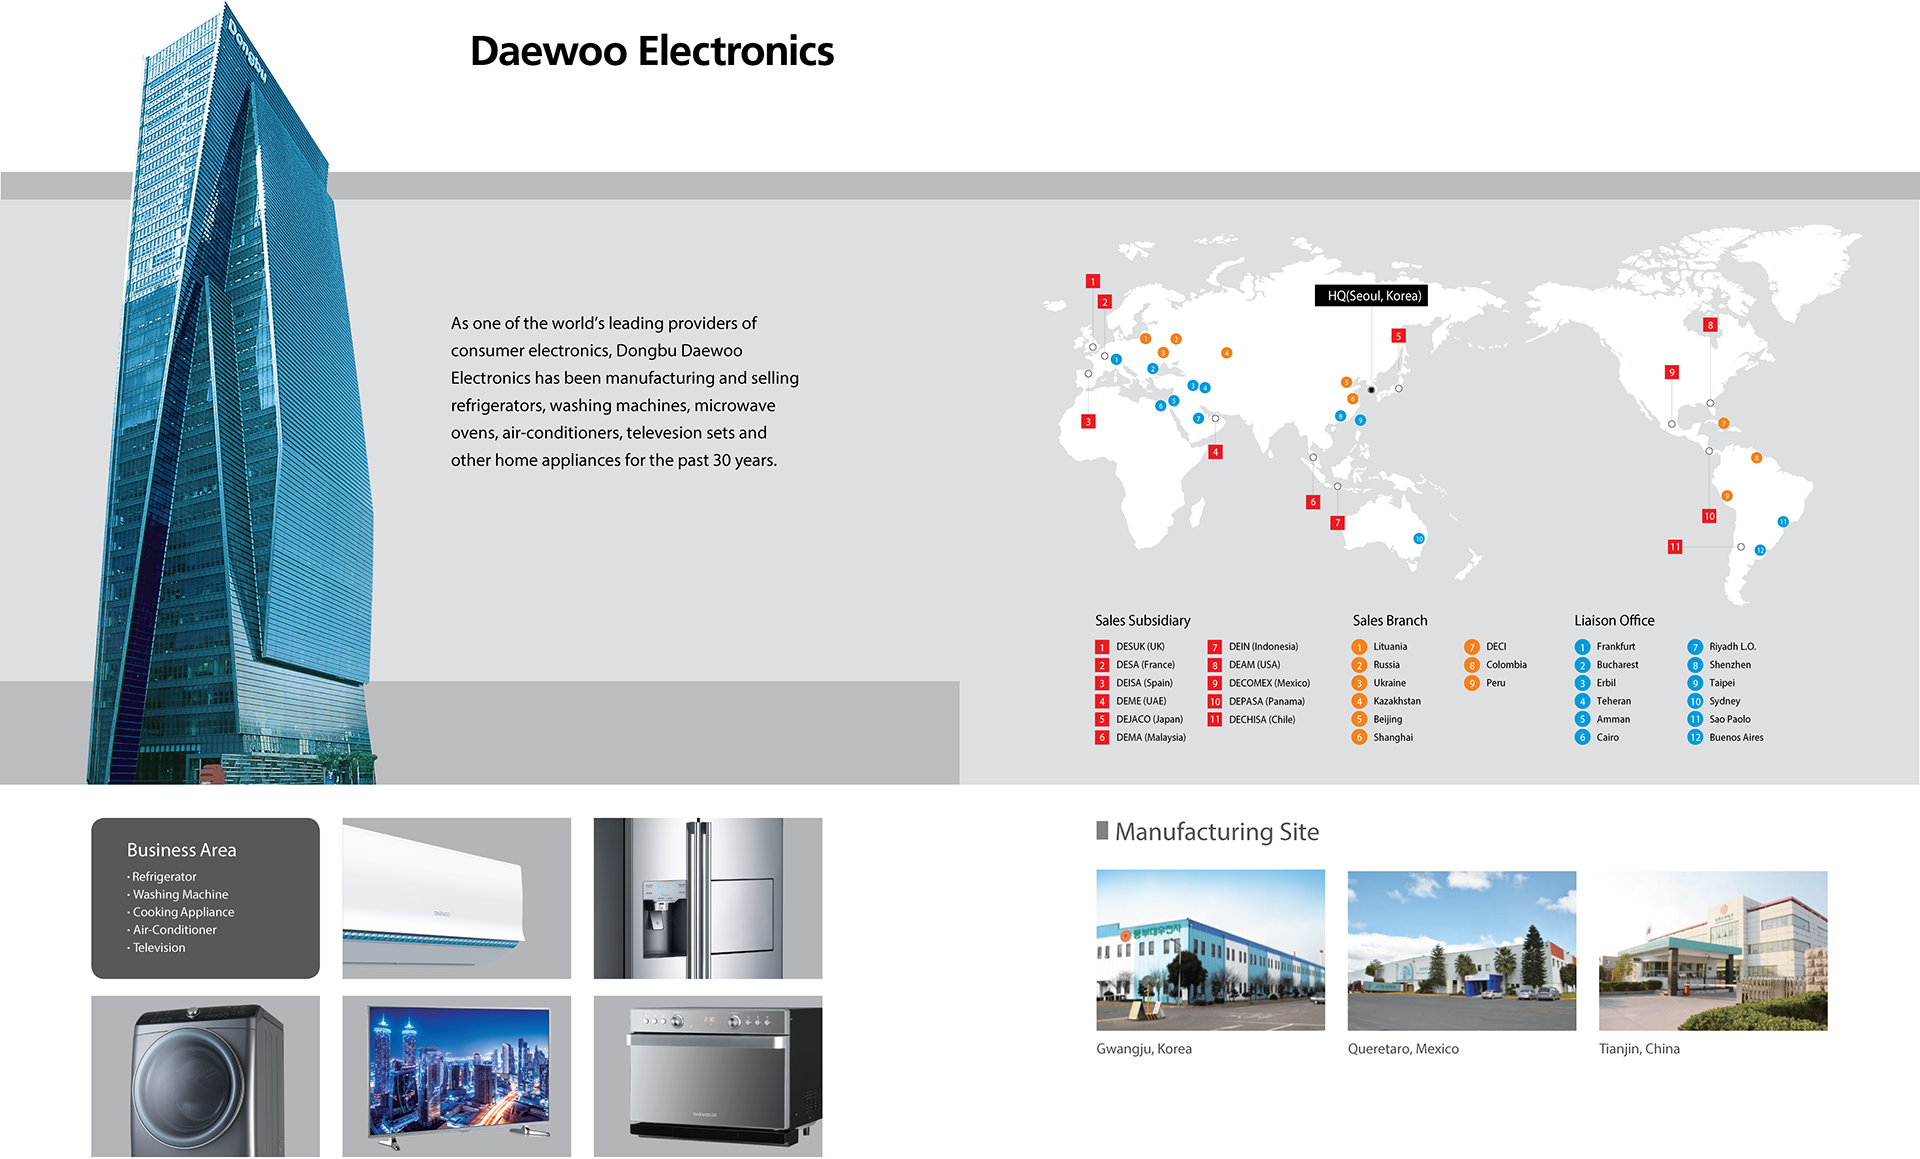 About Us - Daewoo Electronics